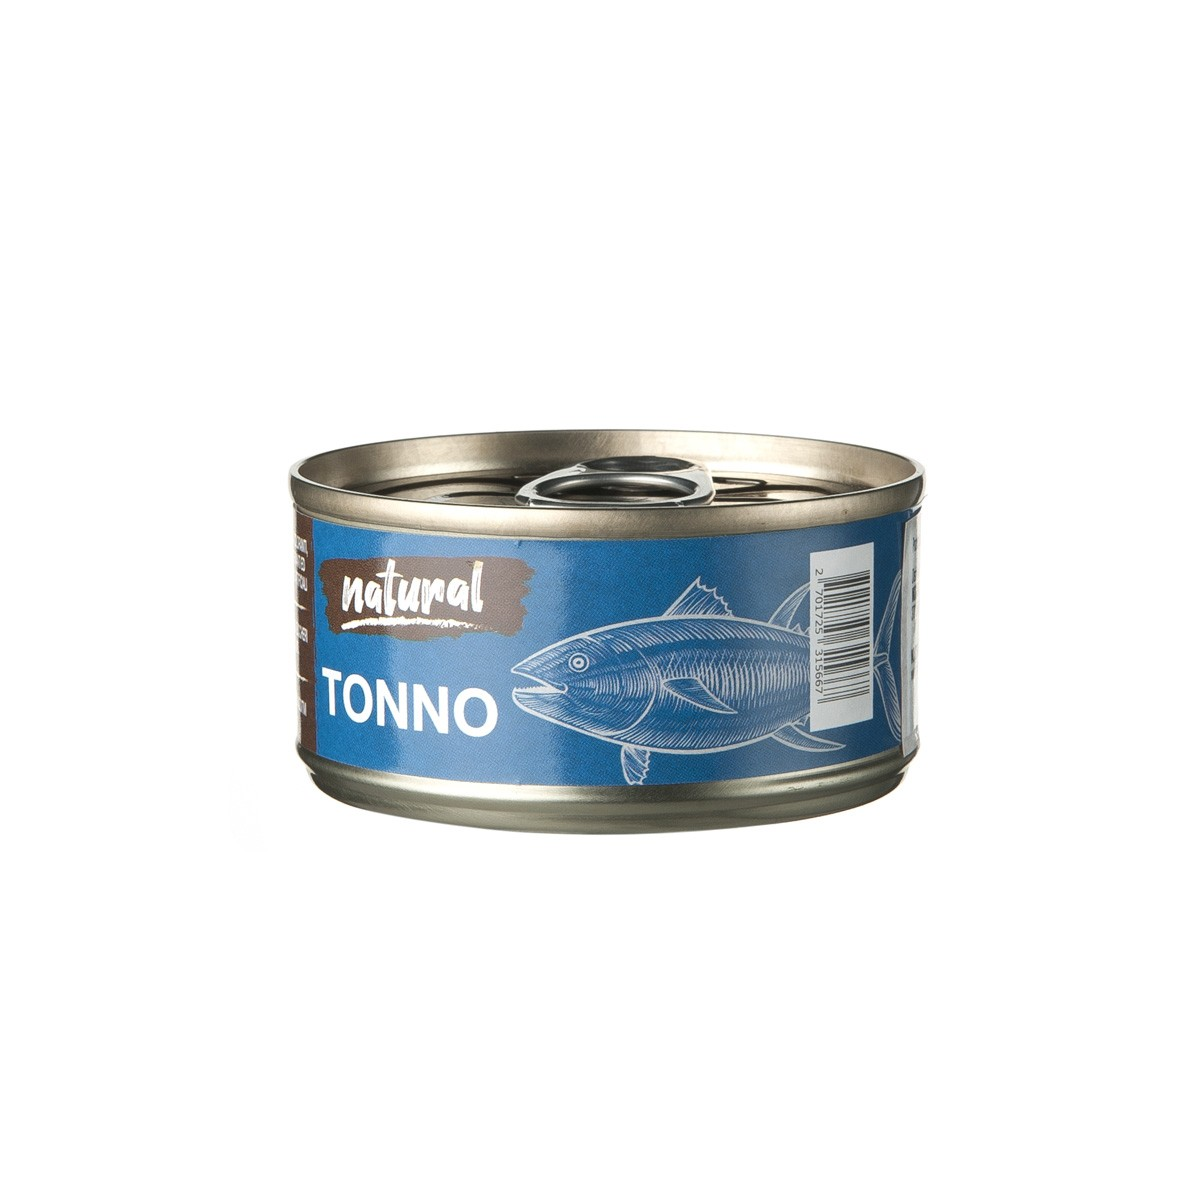 Nutrimi Natural Al Tonno